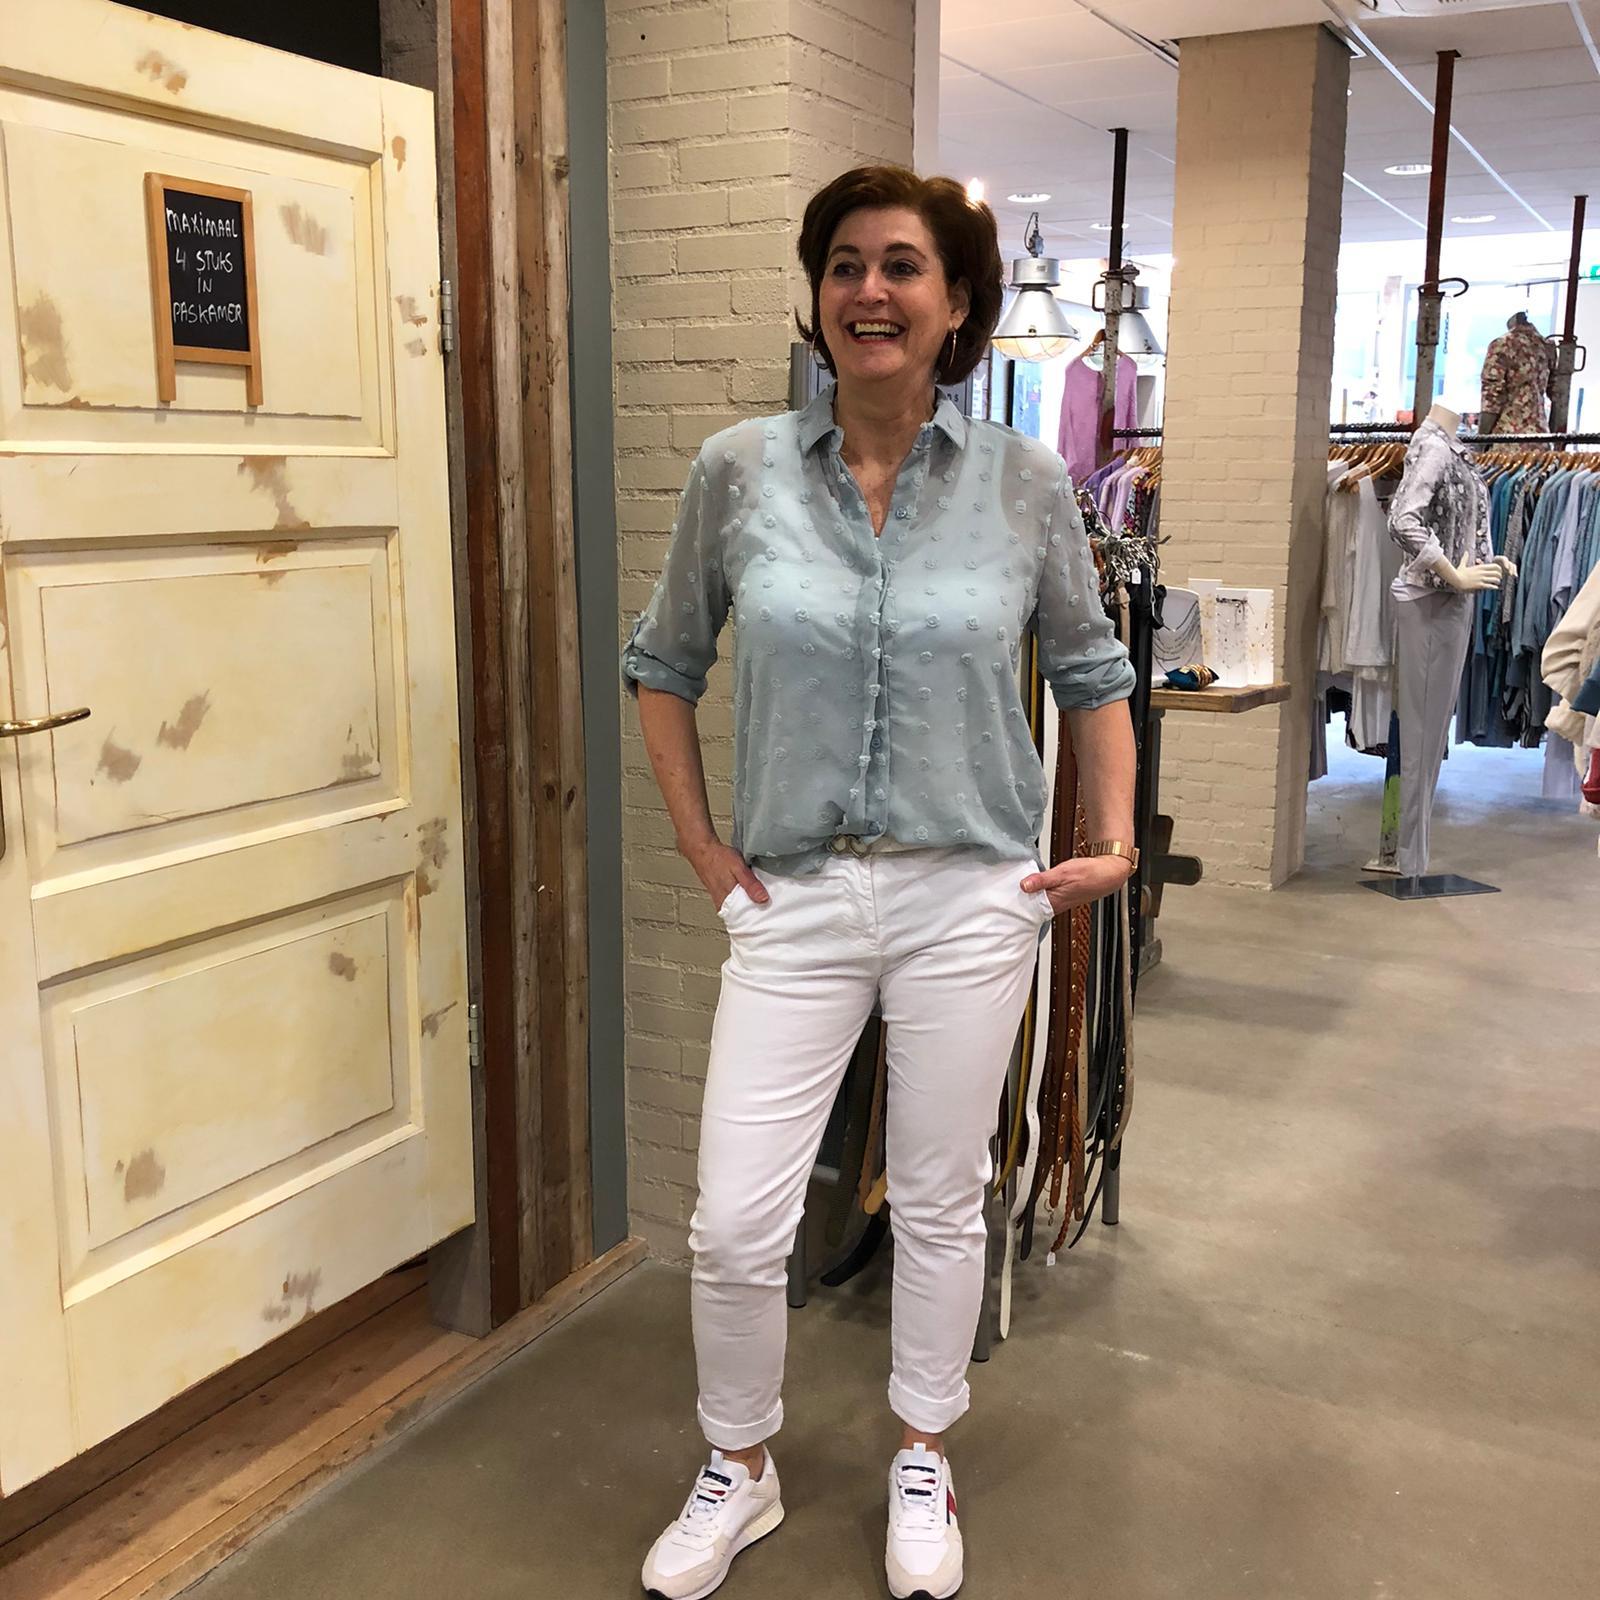 Ambika Blouse Madelynn Lichtblauw Met Nopjes Store3 Mode & Accessoires